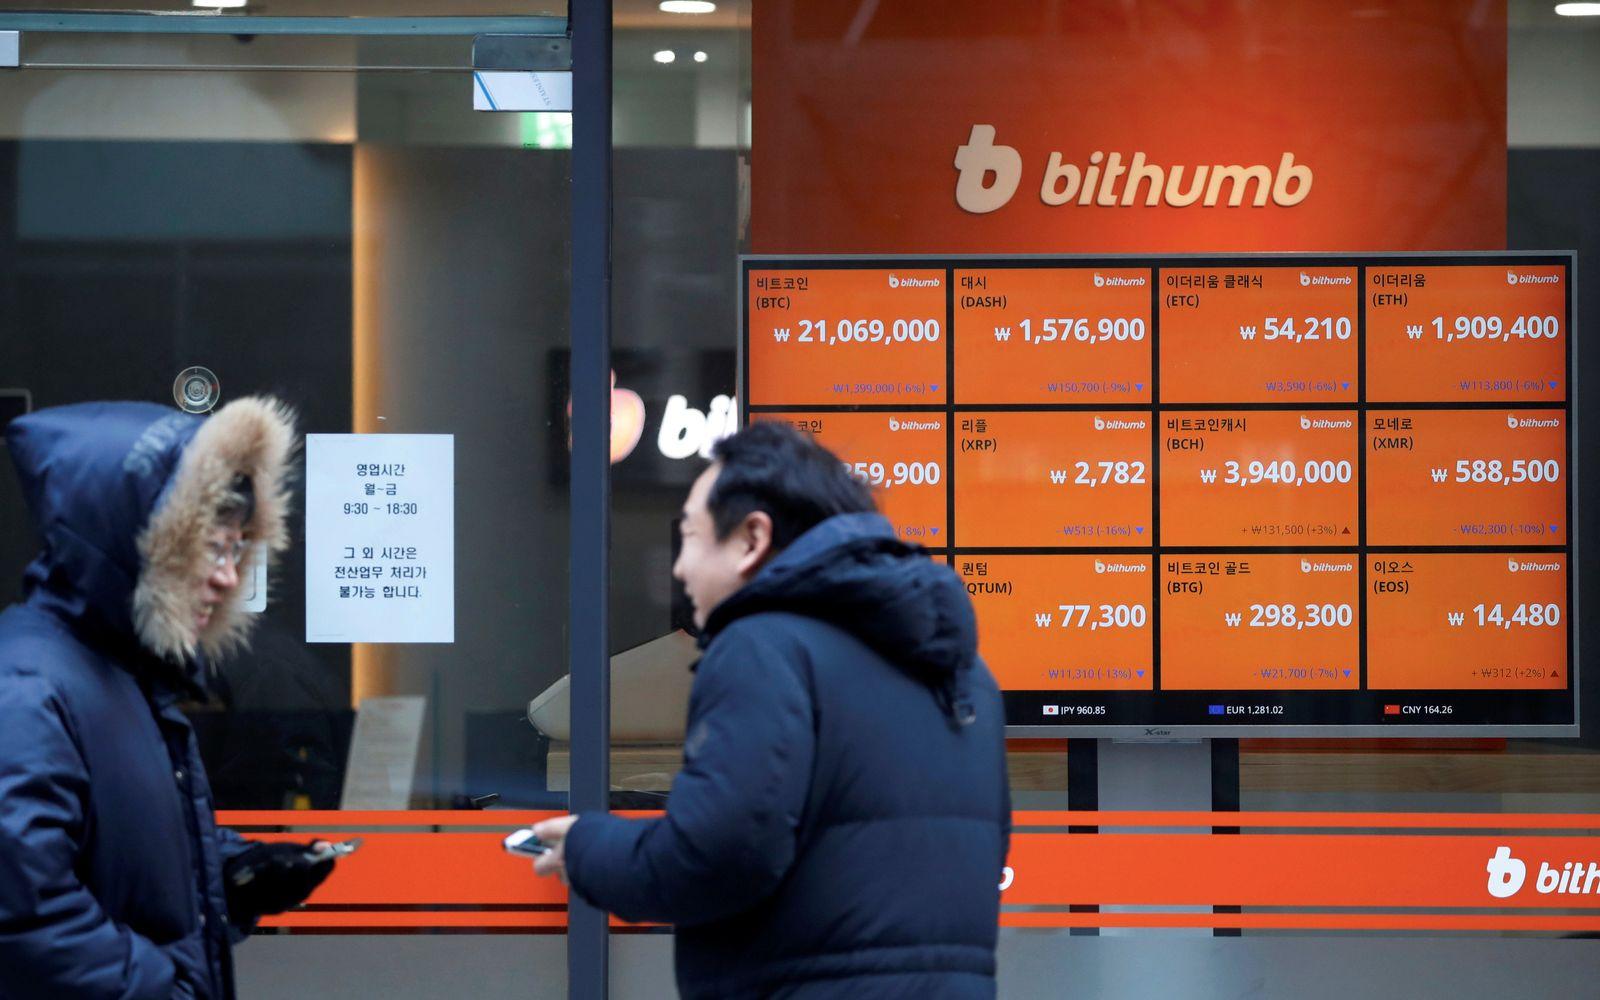 Südkoreas / Kryptowährung / Bitcoin / Börse